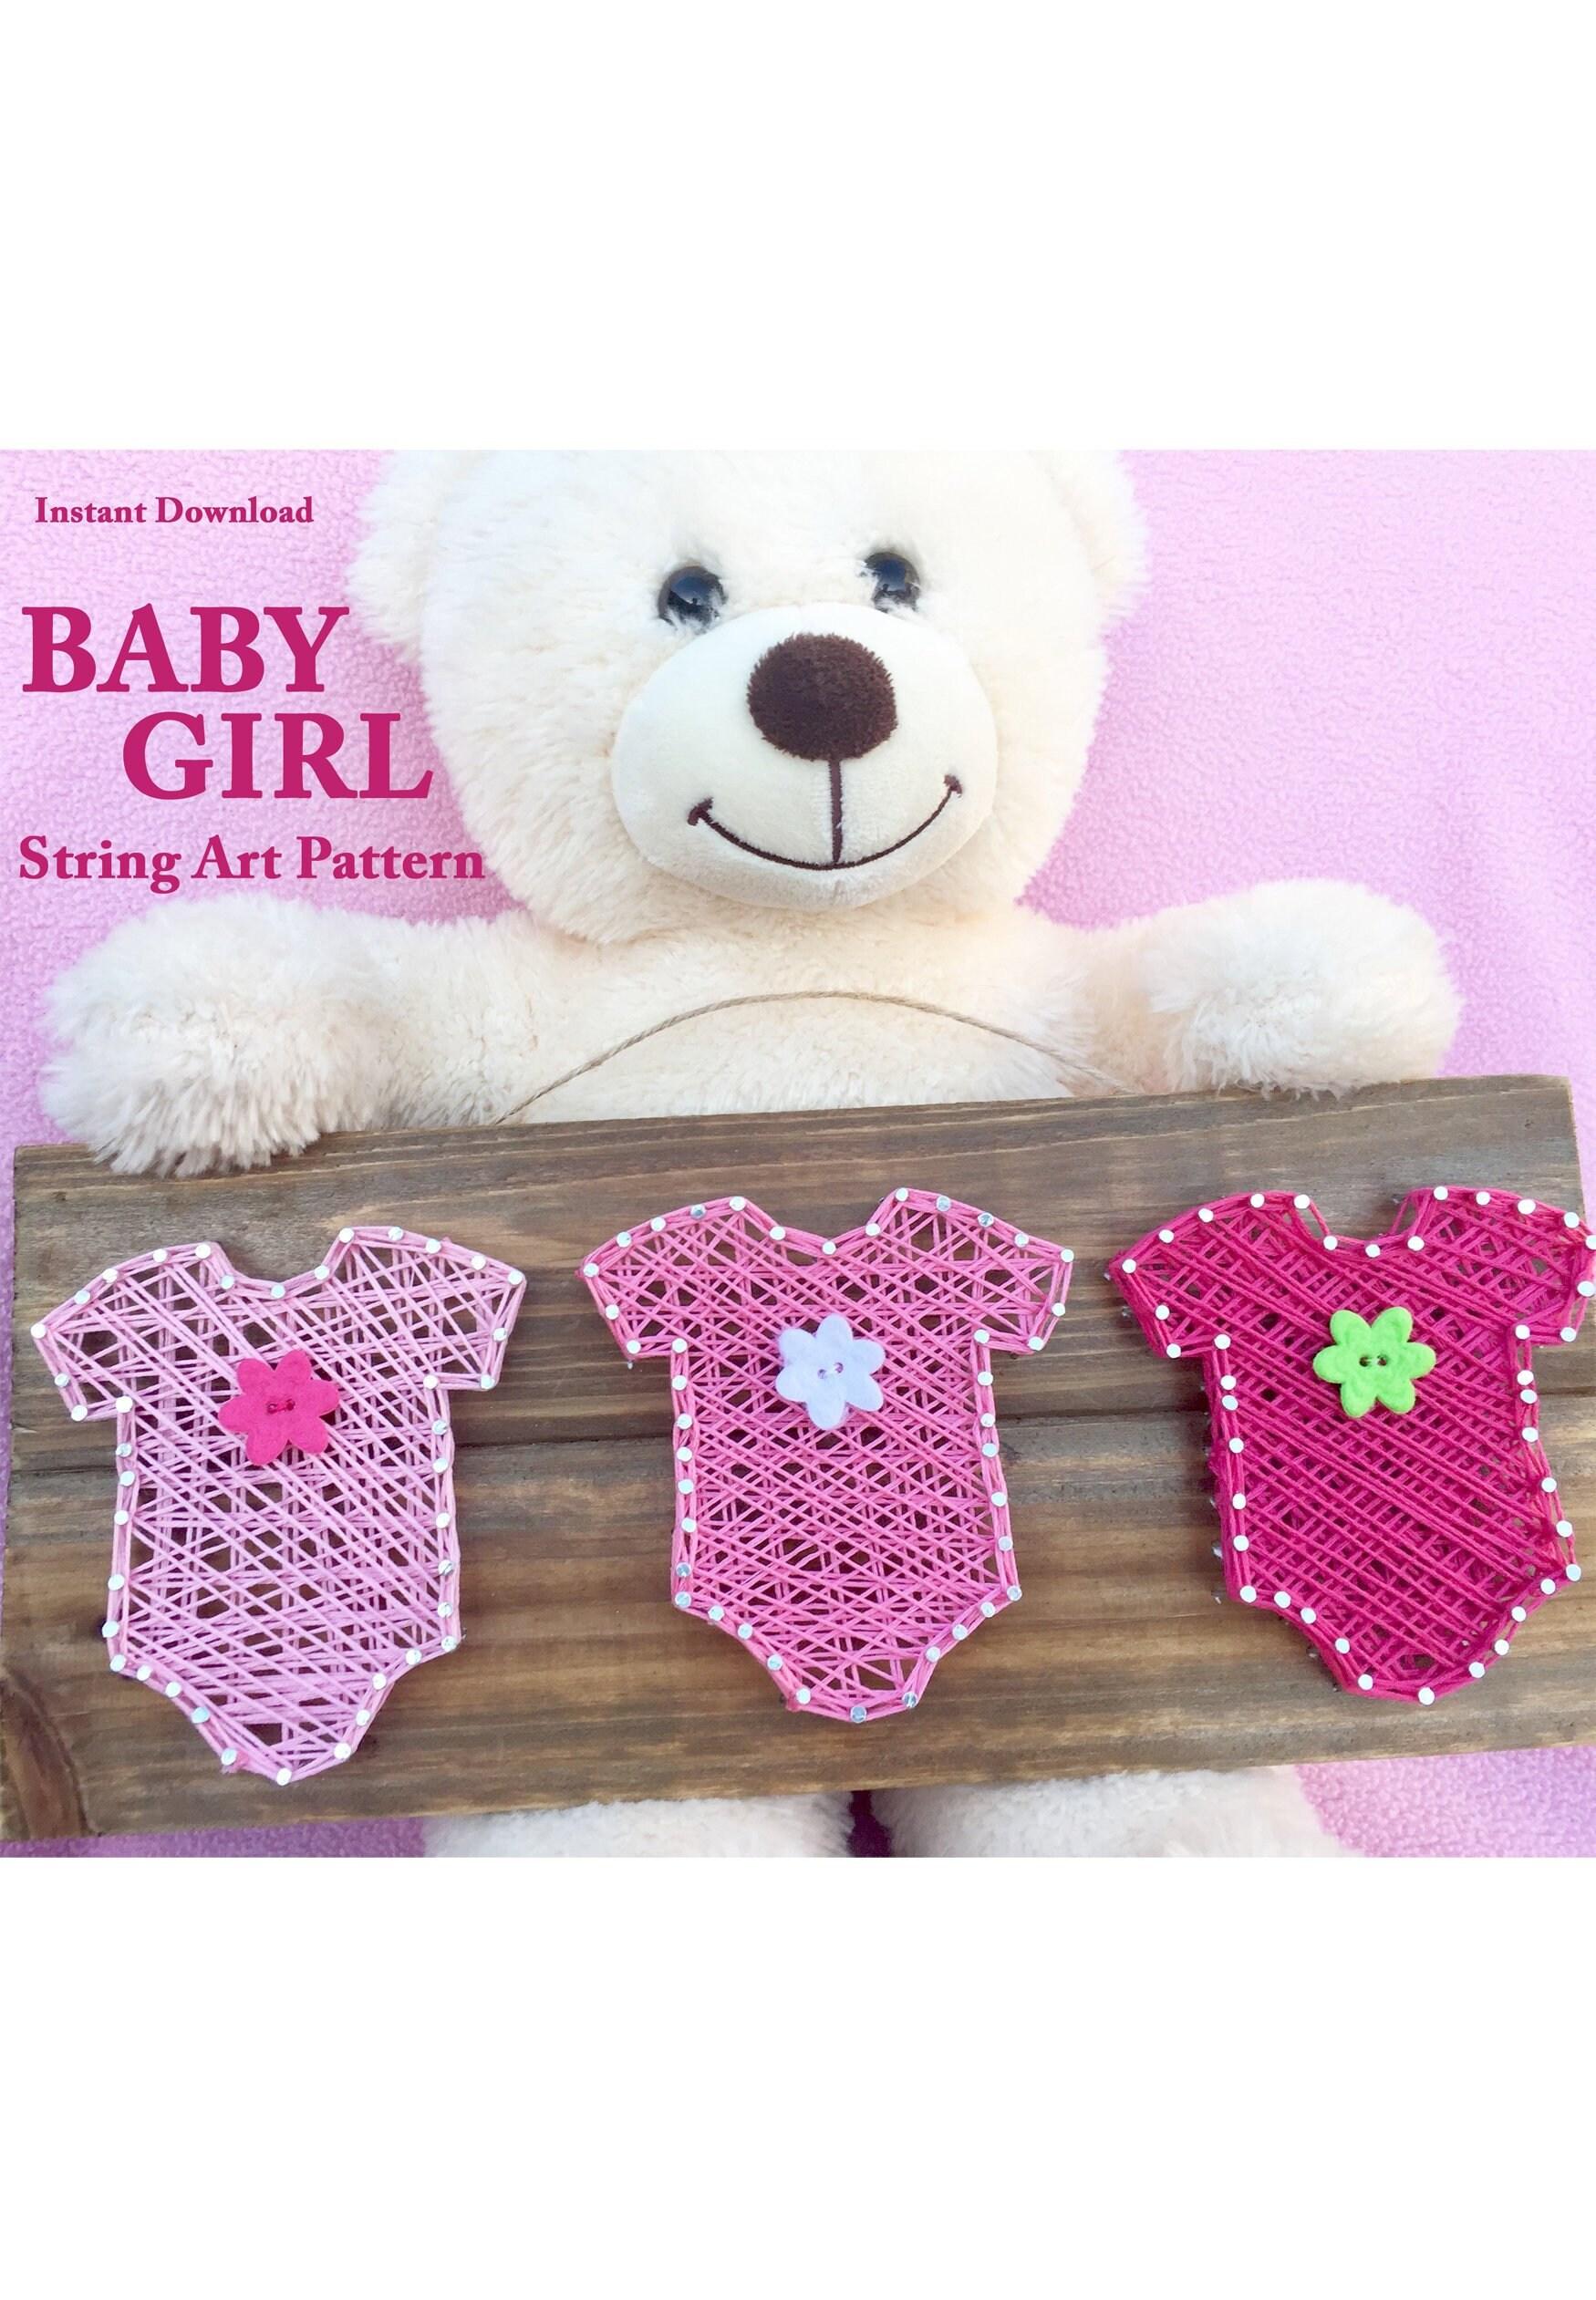 Baby Girl String Art Pattern Adult Craft Teen Craft Baby Etsy